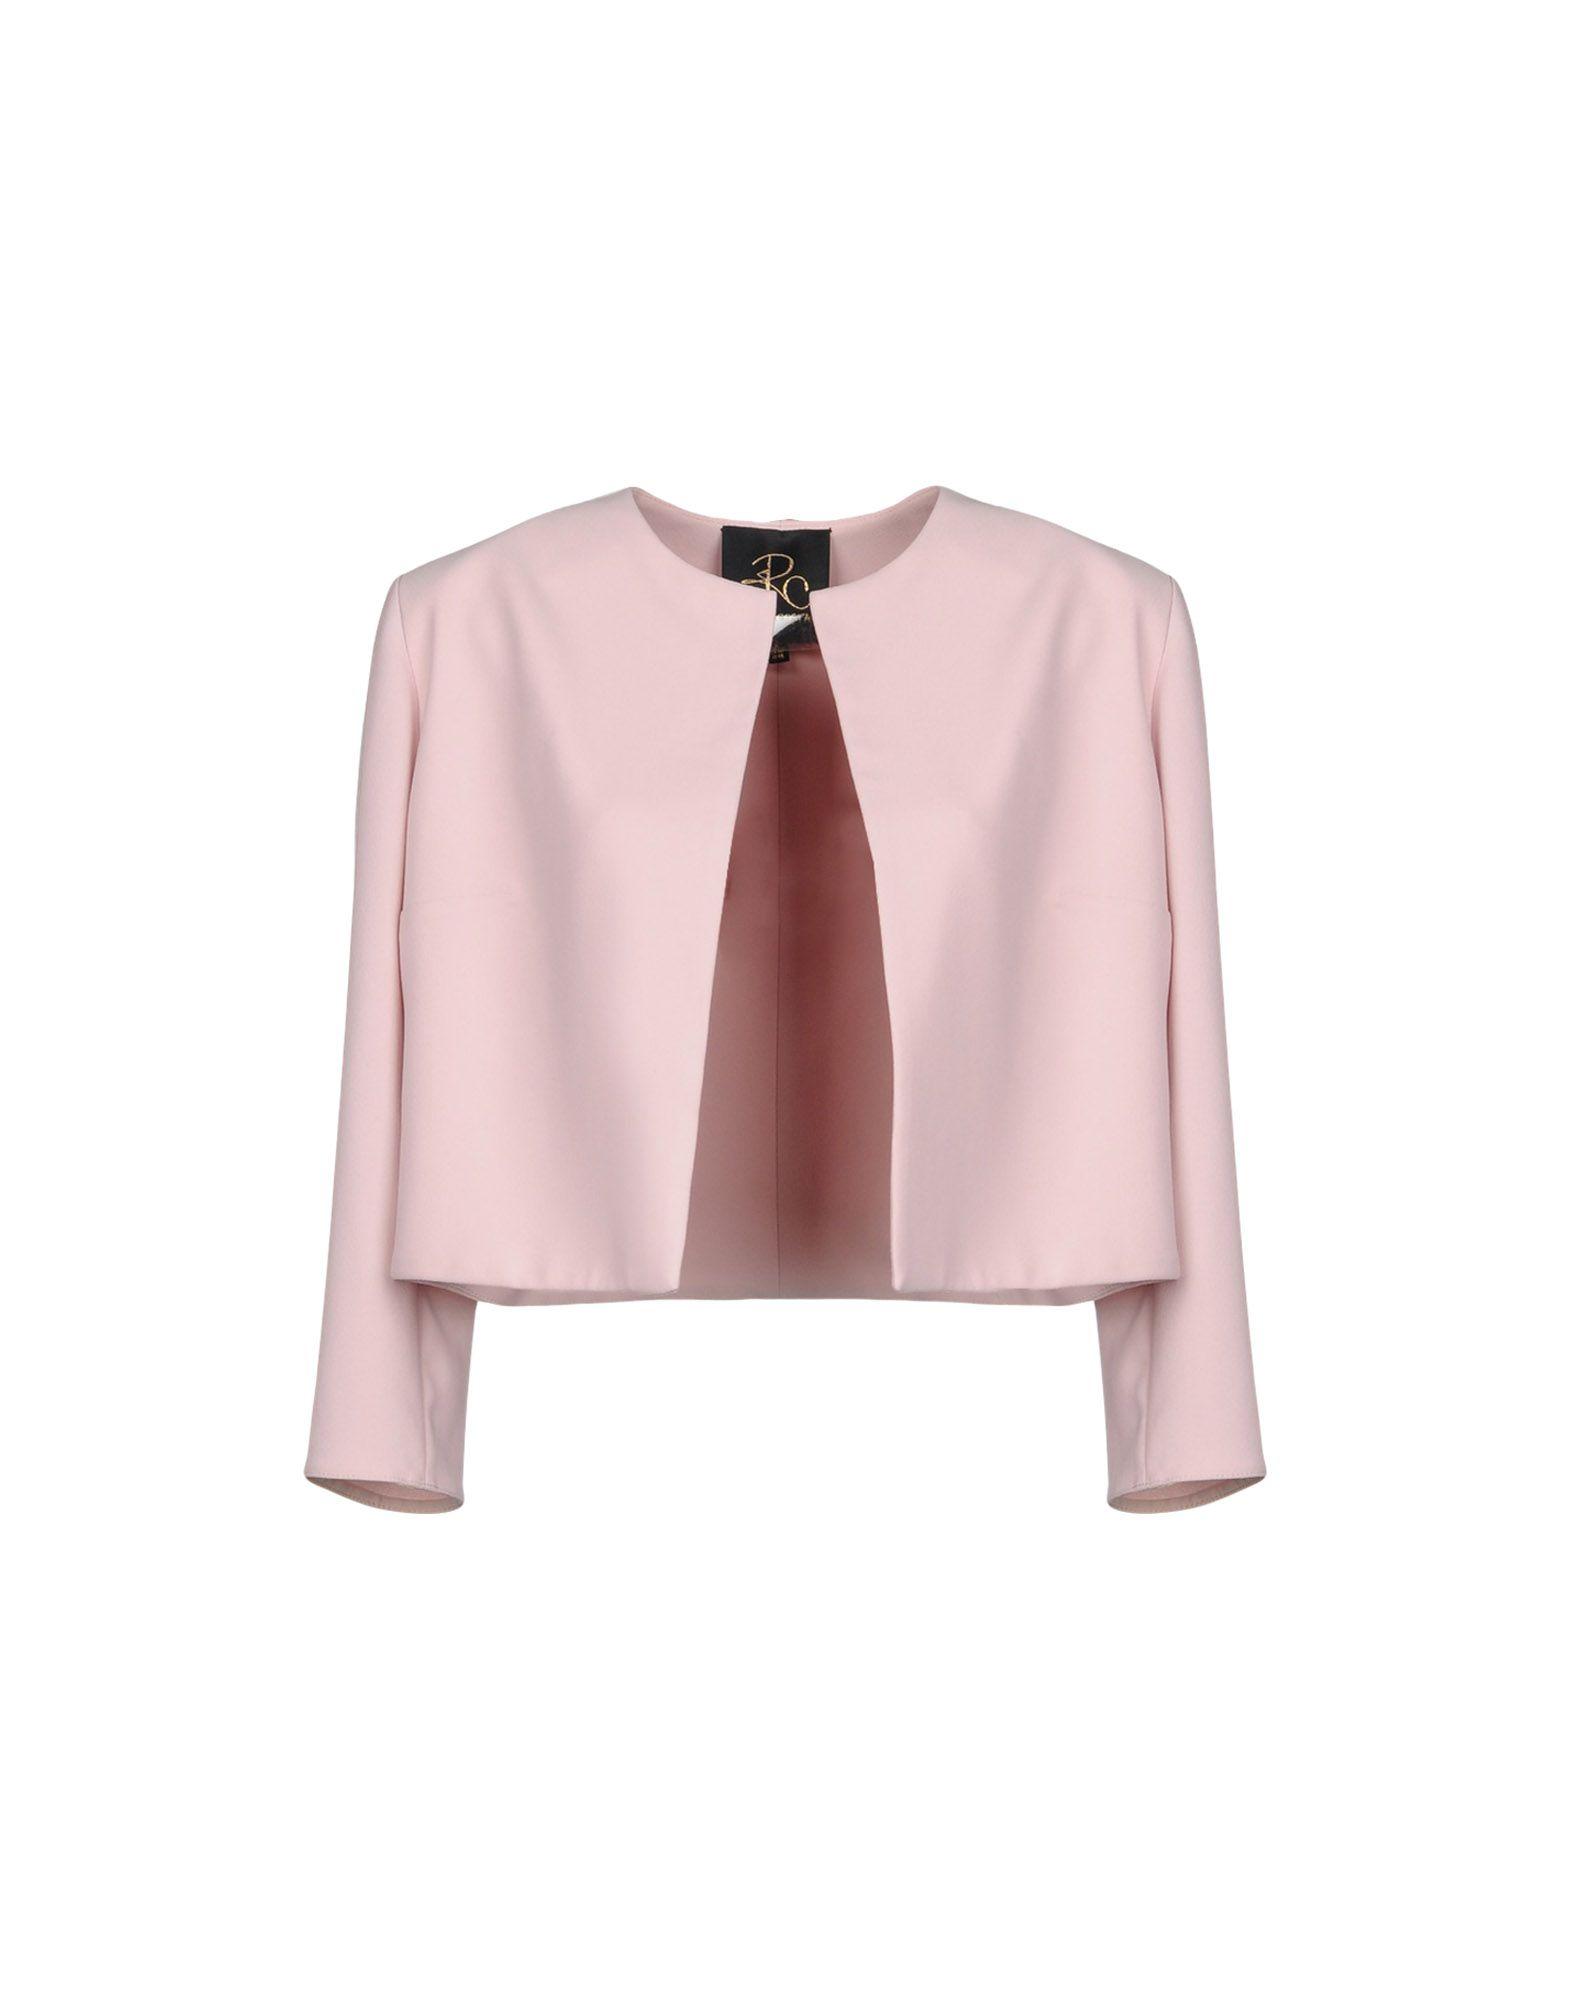 RHEA COSTA Blazer in Light Pink